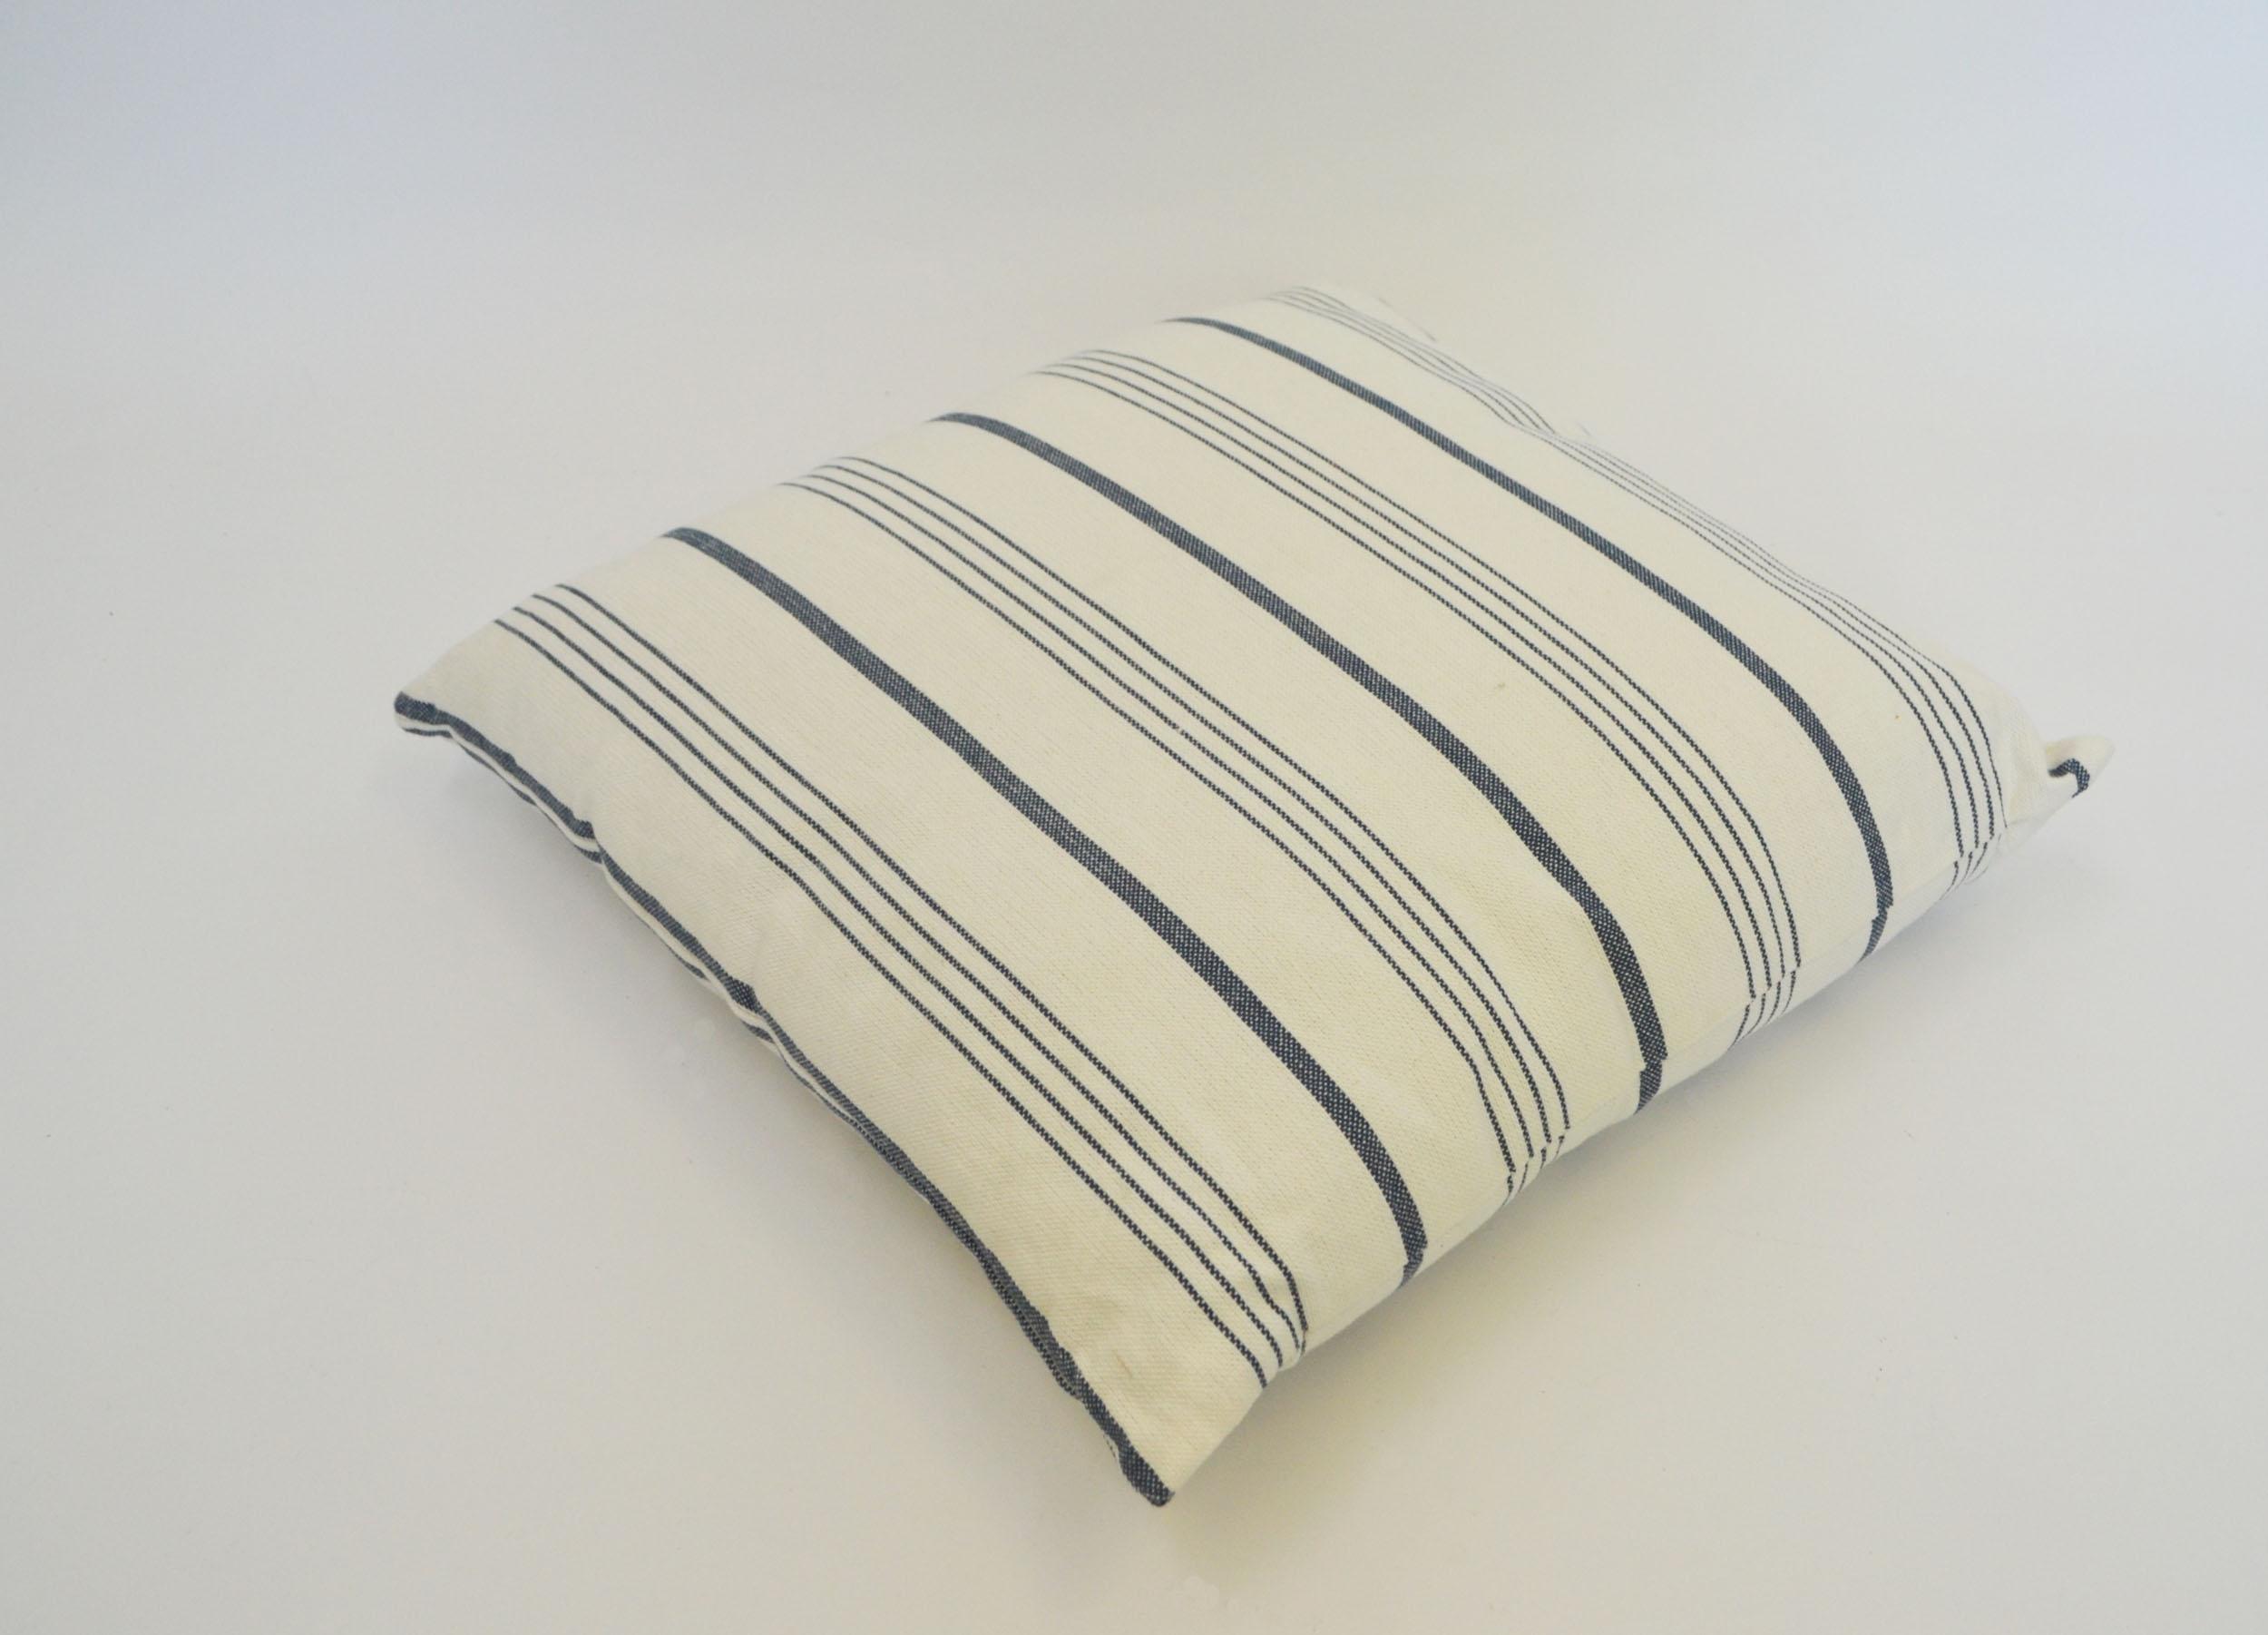 nautical pillow   Quantity: 7  Price: $10.00